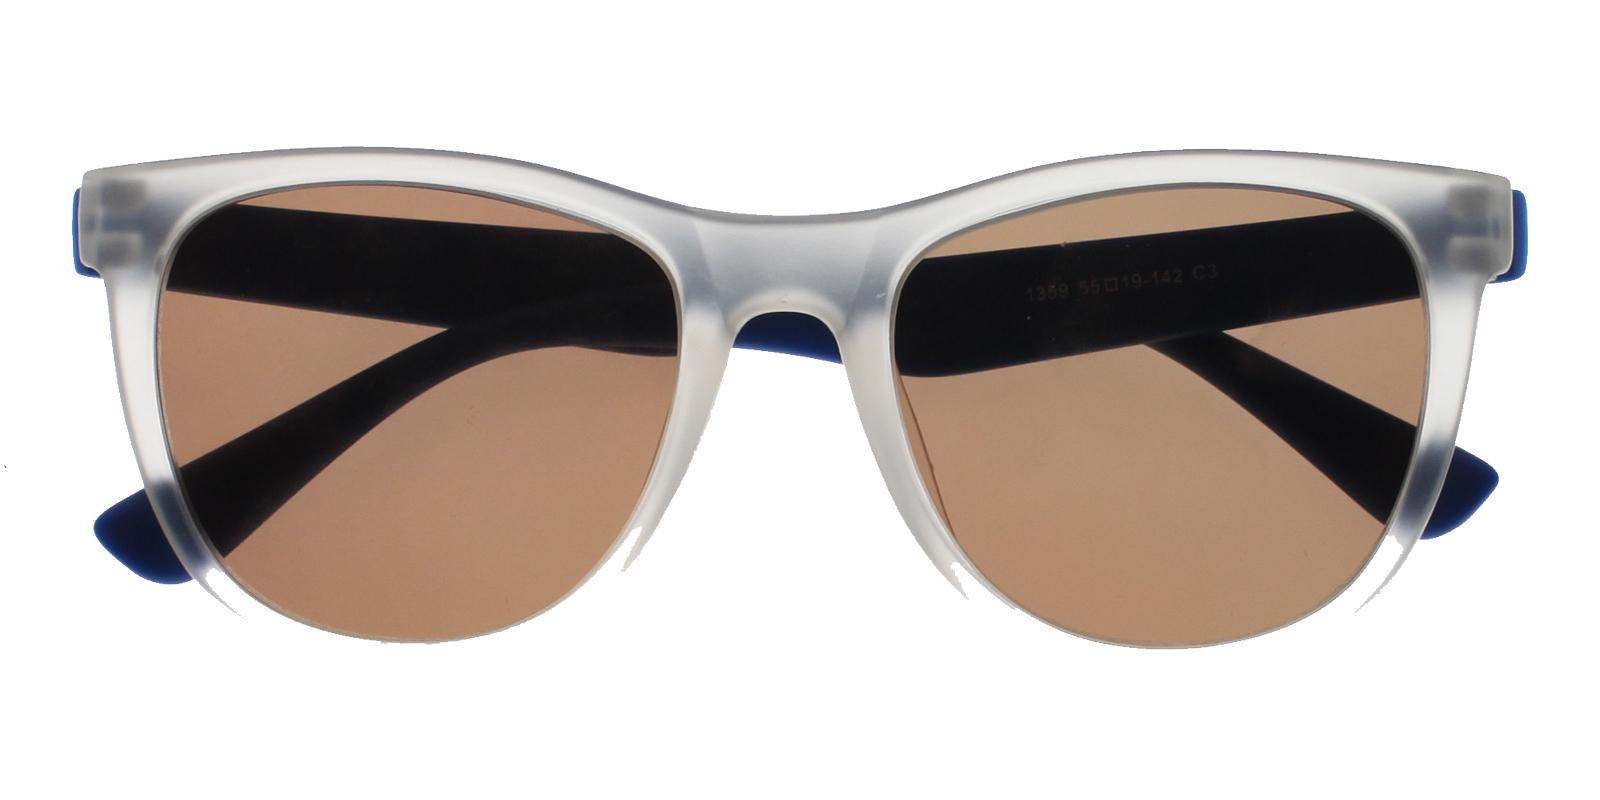 Hallstead Translucent TR Sunglasses , UniversalBridgeFit Frames from ABBE Glasses